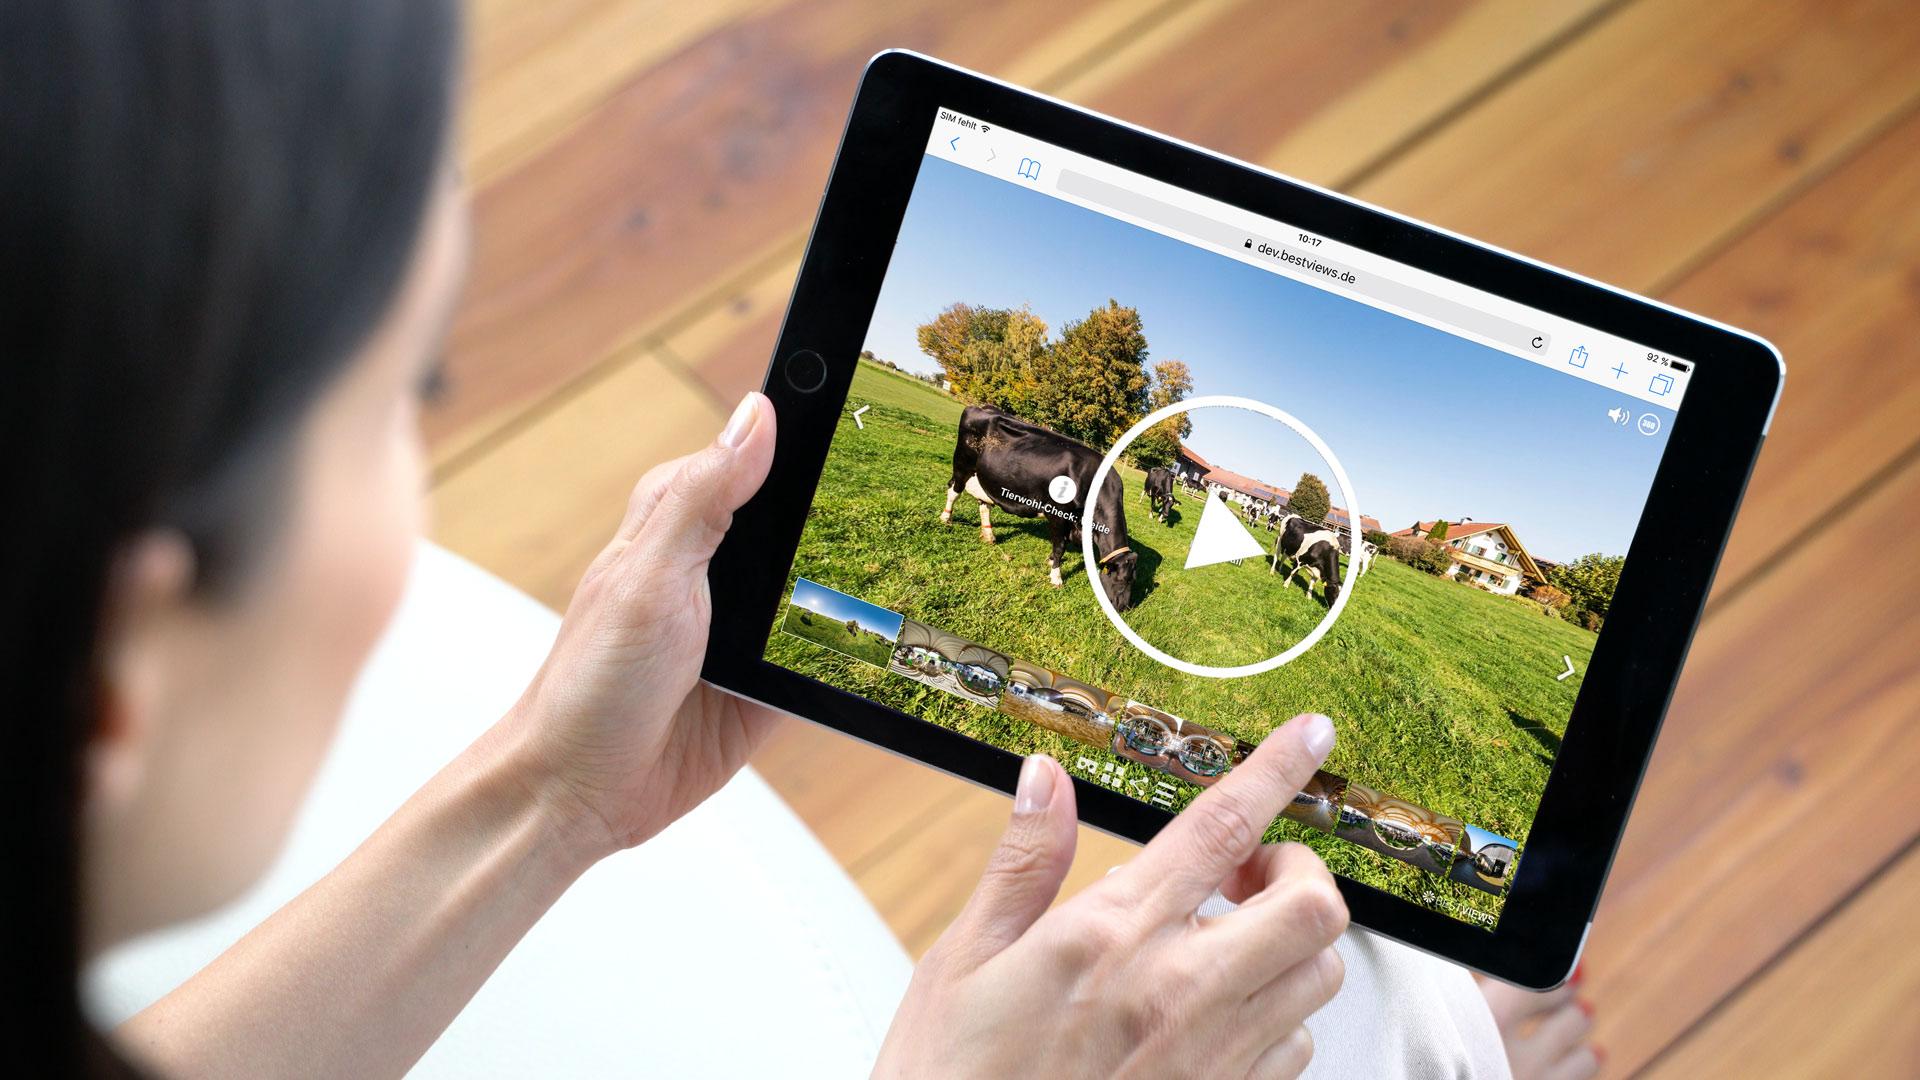 virtuelles 360 Grad Video mit dem Tablet live erleben